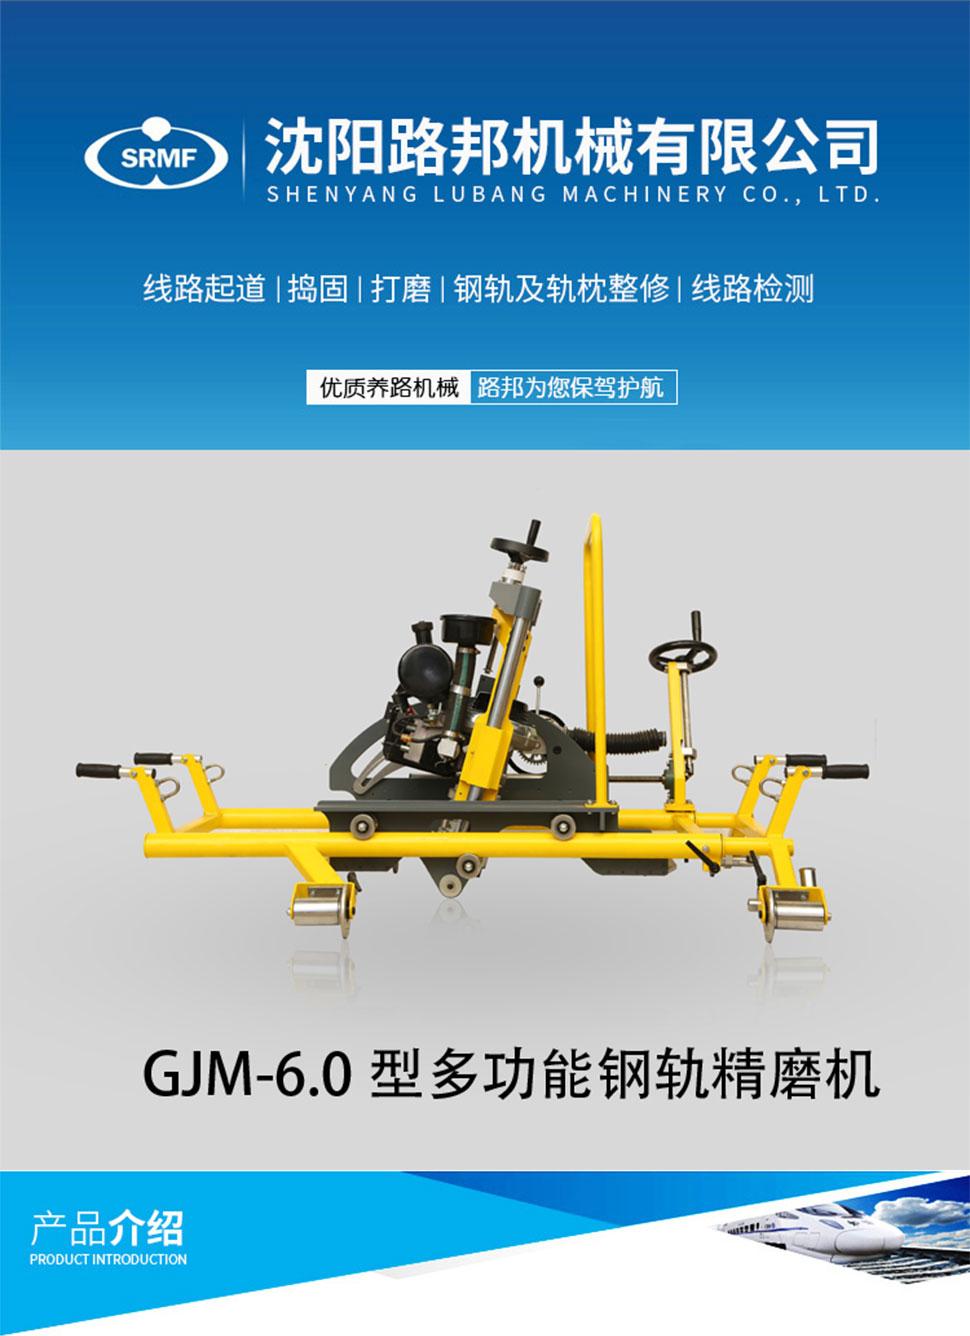 GJM-6.0型多功能钢轨精磨机